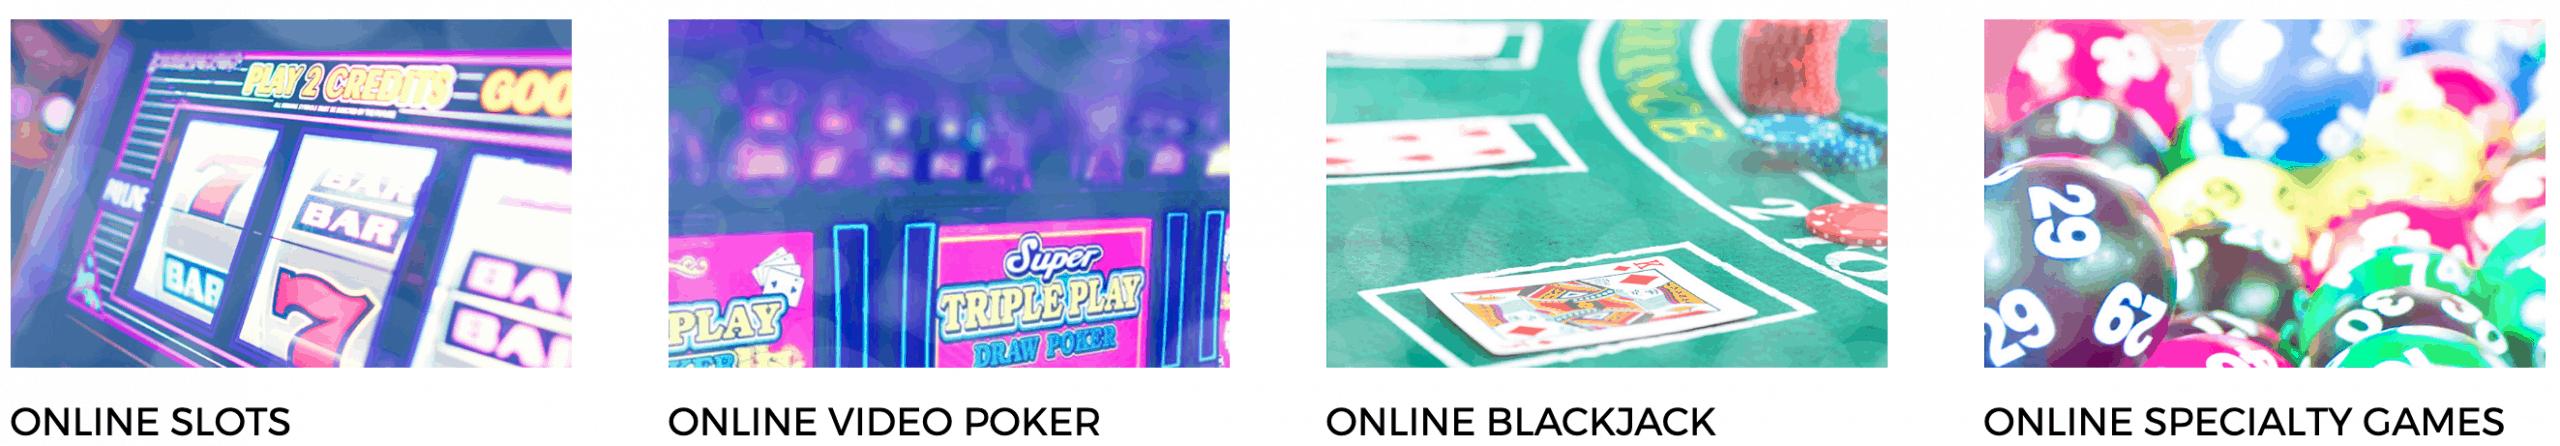 Slots.LV Games